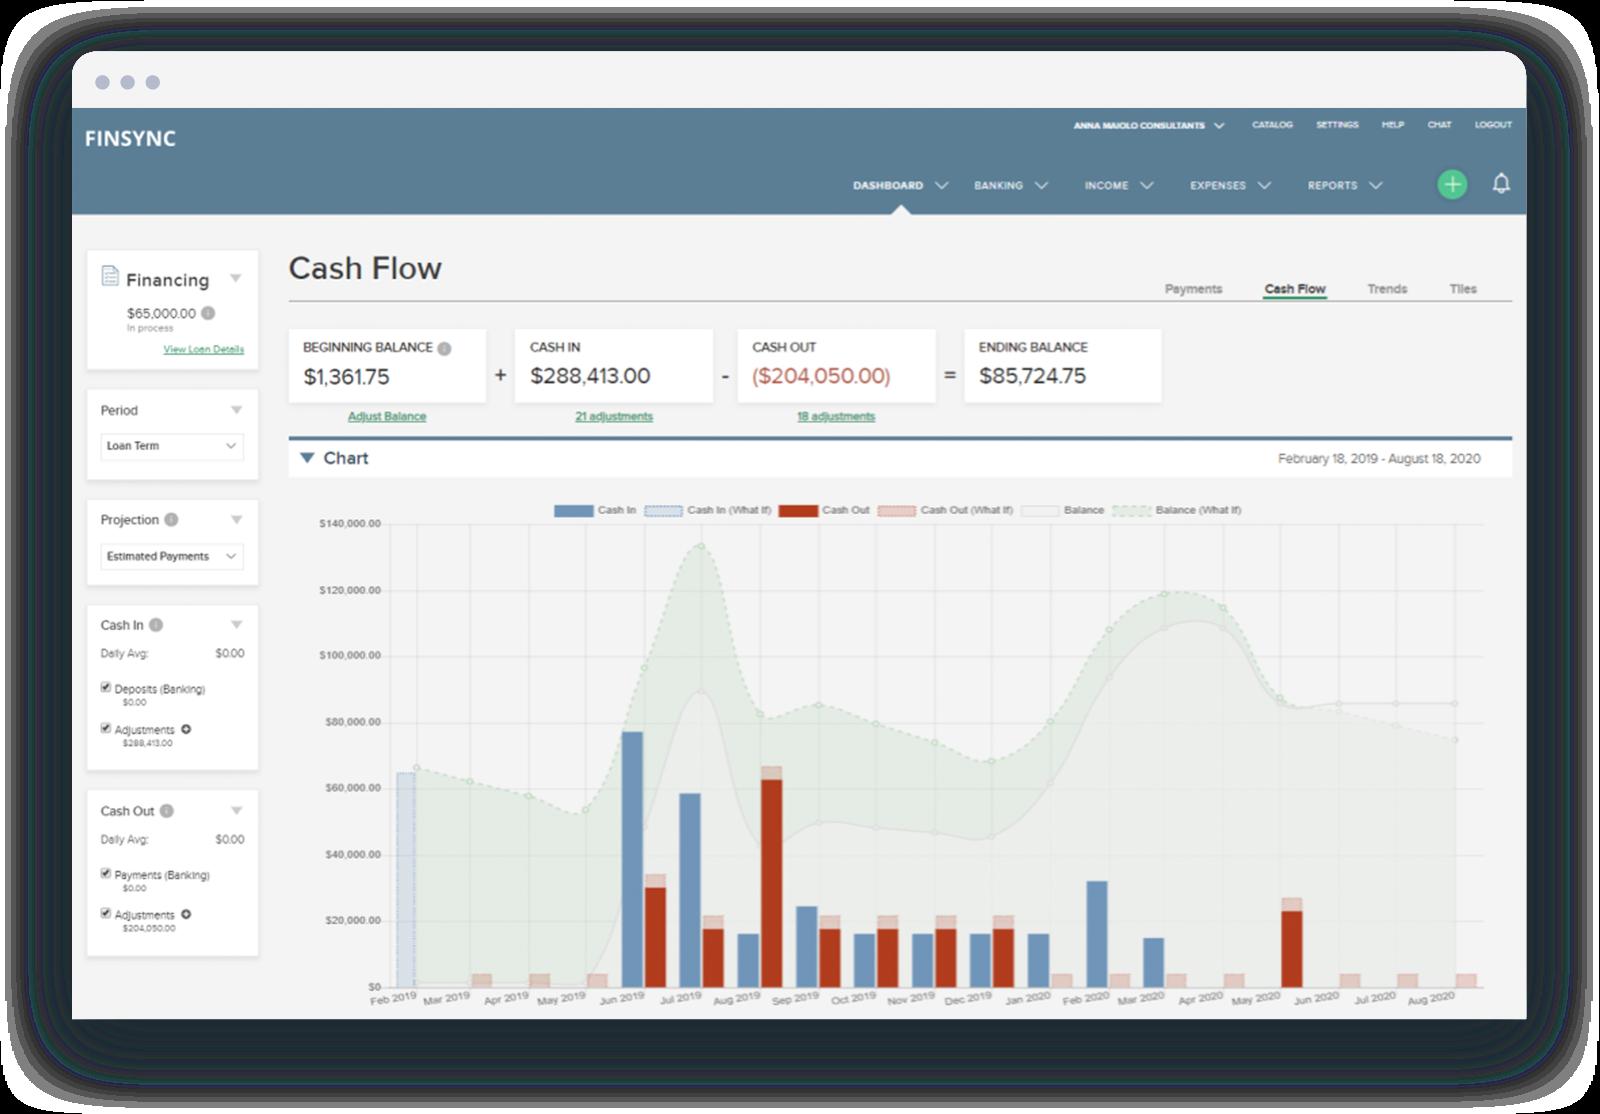 CashFlow-Top-Level-Nav